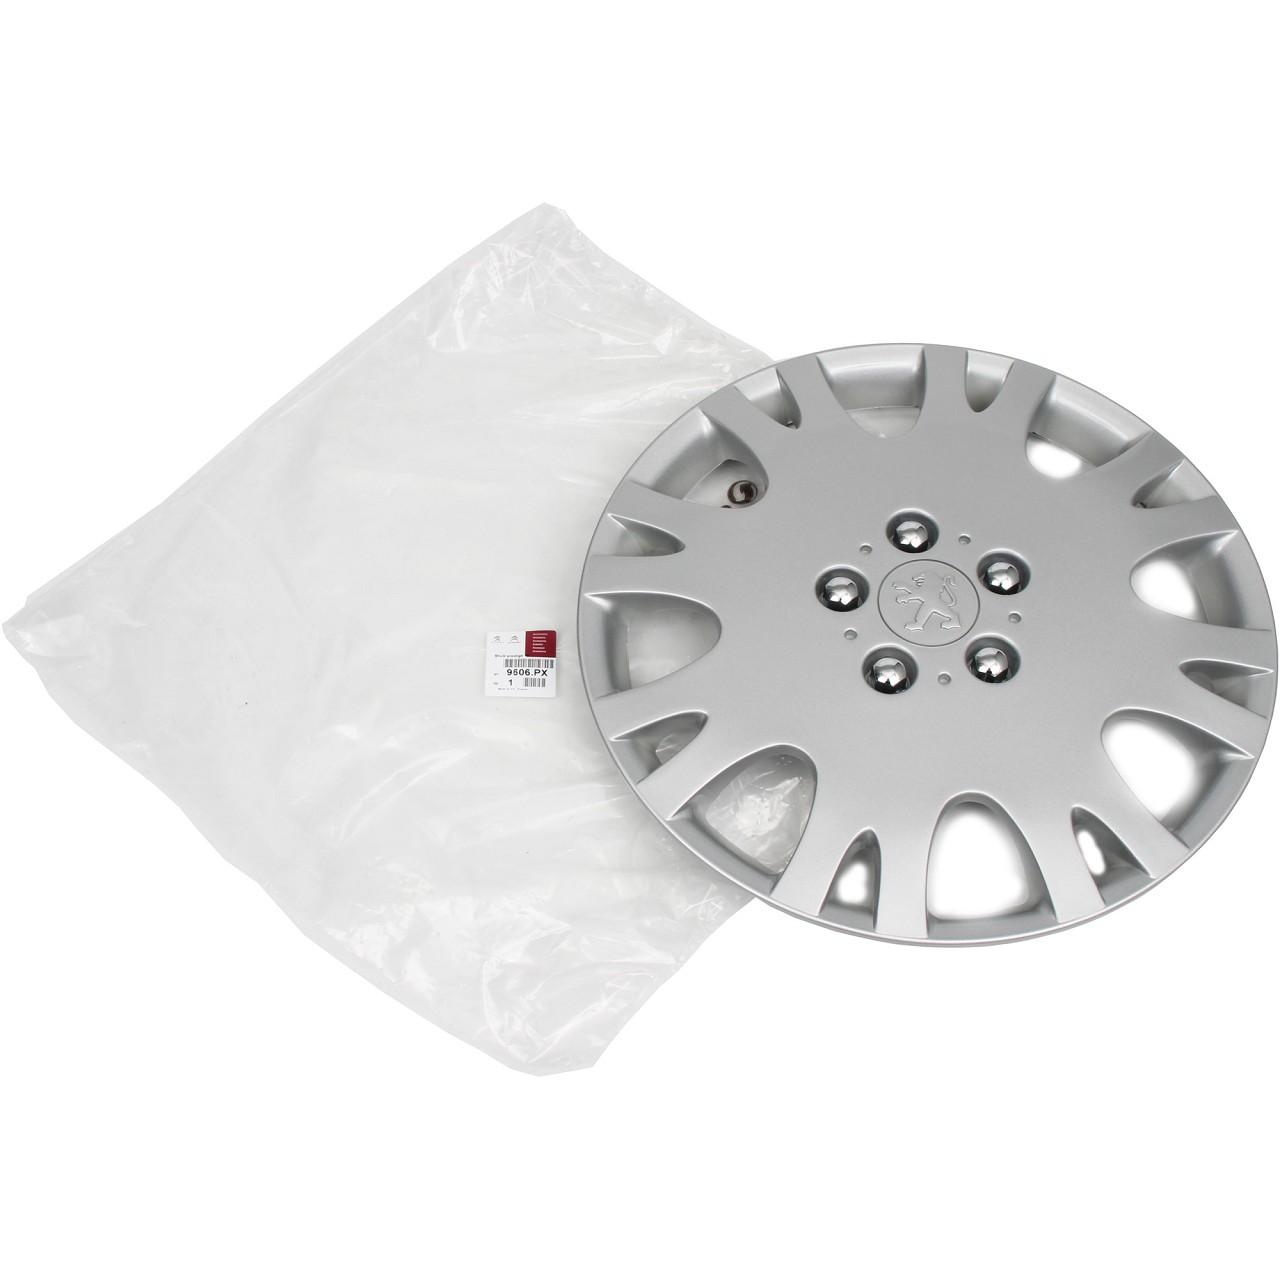 ORIGINAL Peugeot Radkappe Radblende 16 Zoll PRESTIGE 207 307 308 406 407 9606.PX